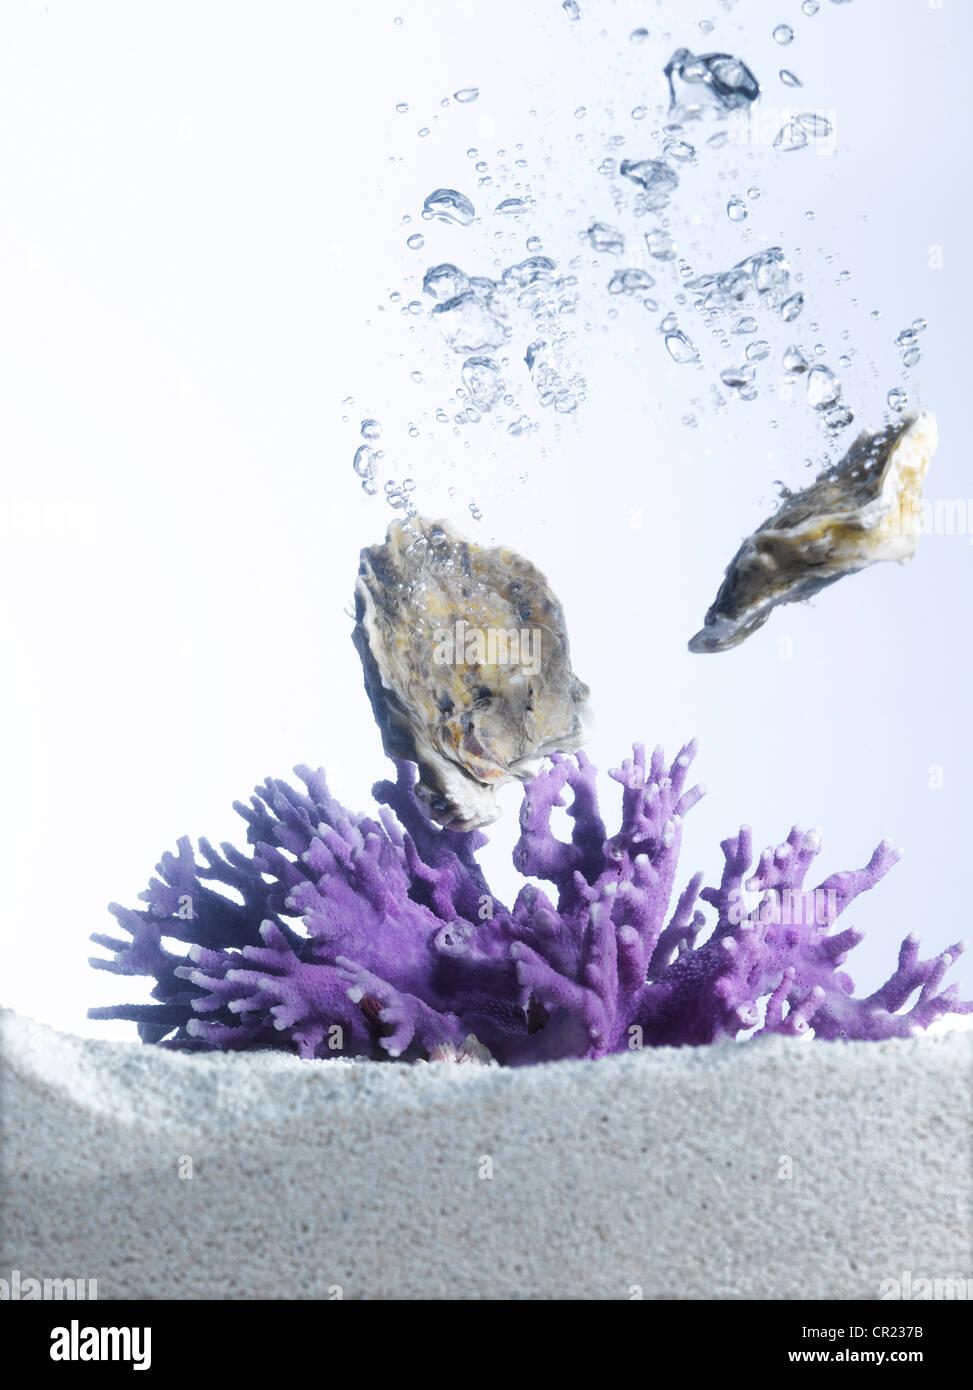 Las ostras en agua con coral púrpura Imagen De Stock